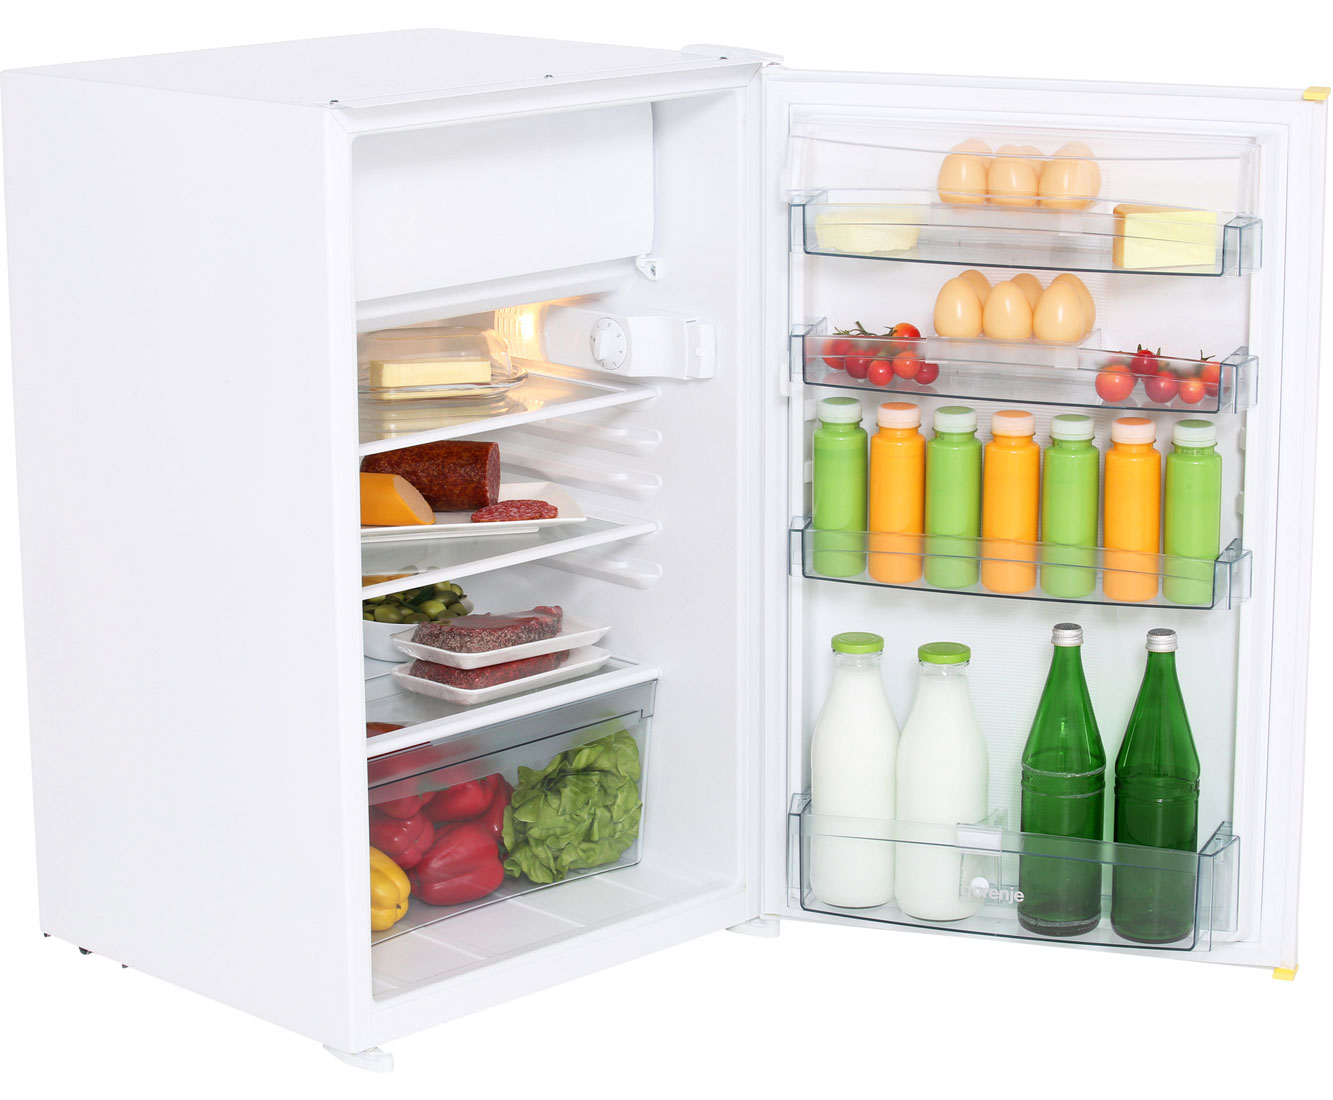 Amica Uks 16147 Unterbau Kühlschrank 50cm Dekorfähig : Unterbau kühlschrank dekorfähig kühlschränke v zug ag schweiz